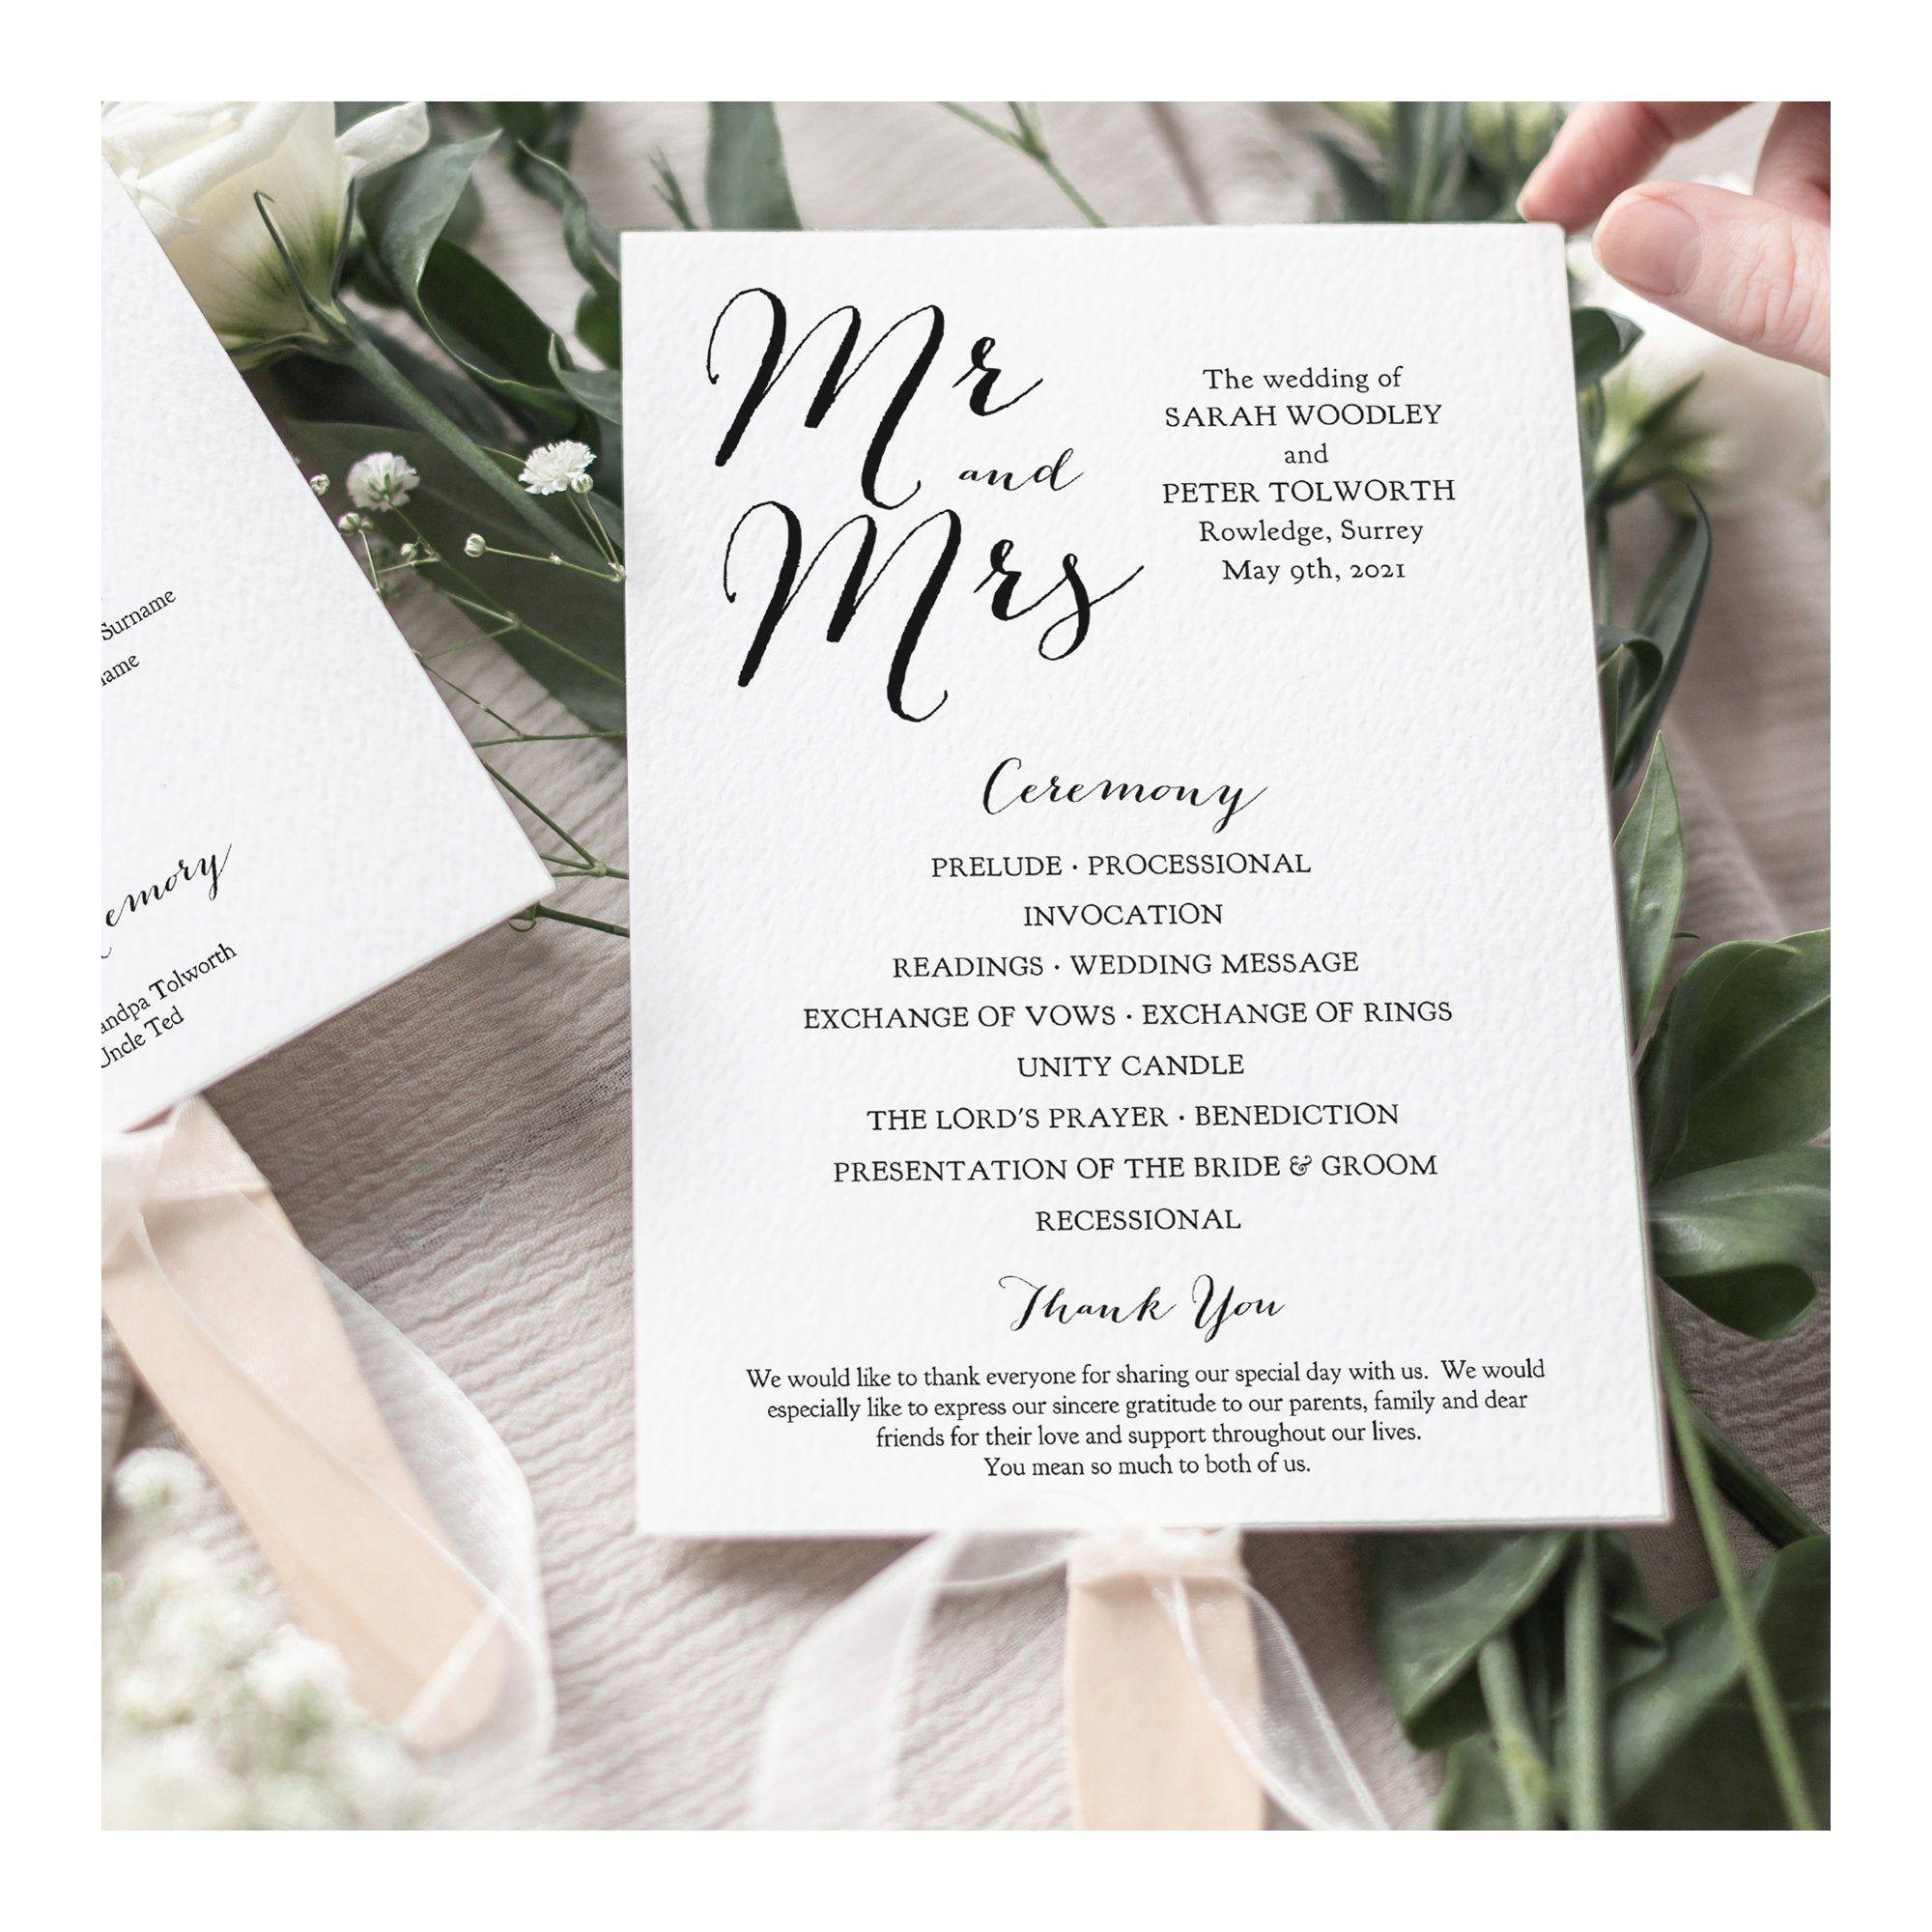 007 Marvelou Wedding Program Template Free Download Photo  Downloadable Pdf Reception Microsoft Word FanFull